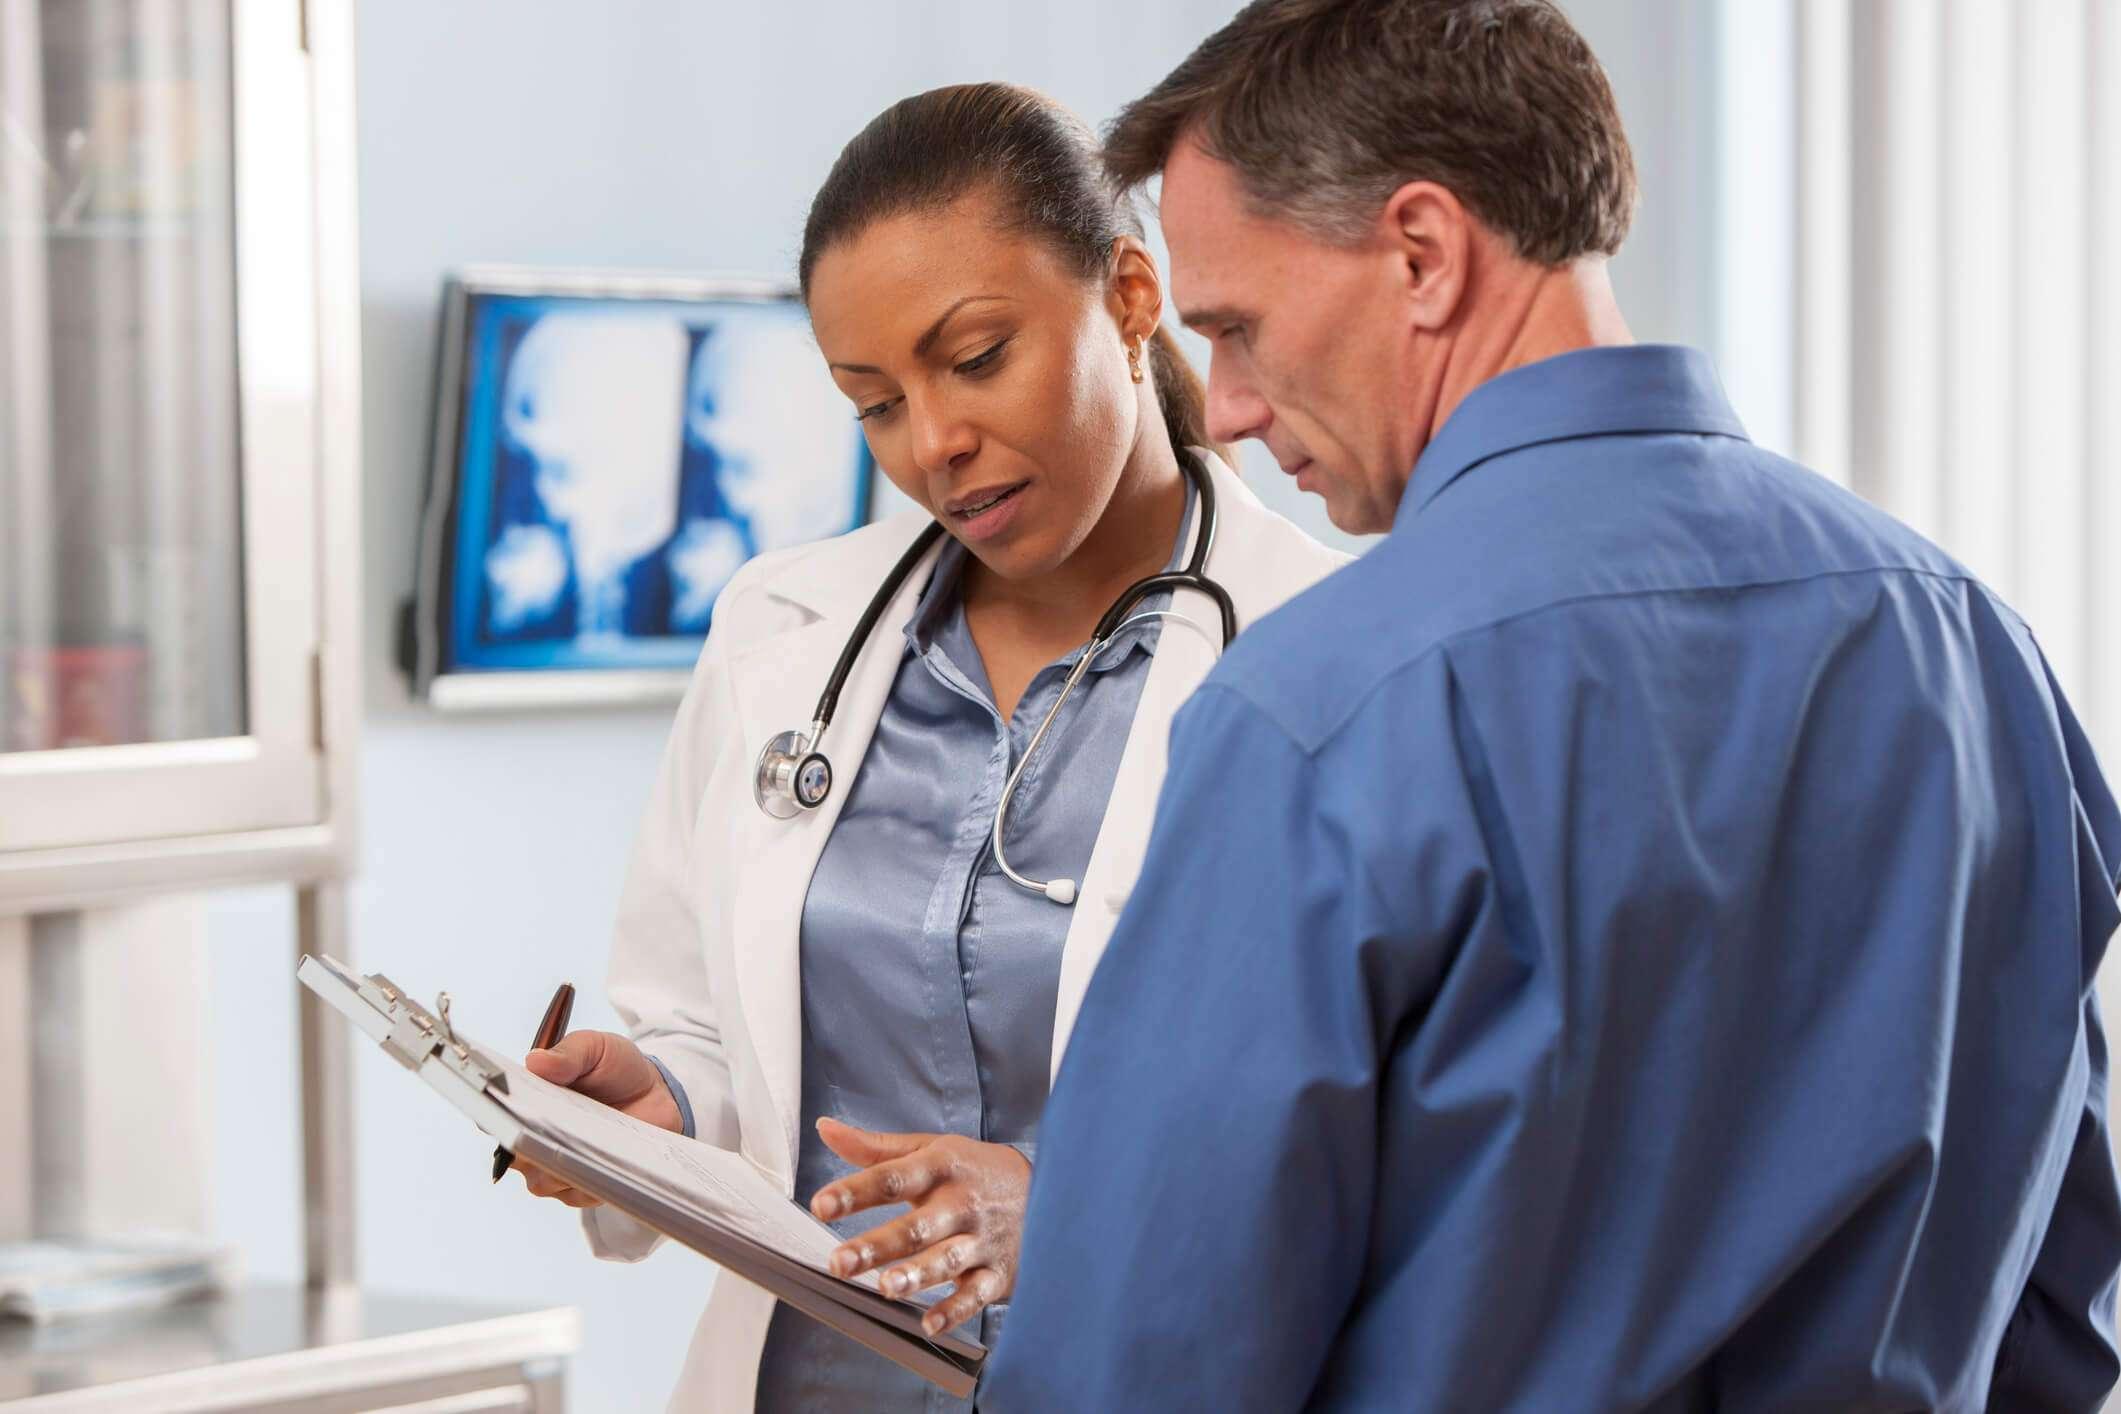 Como é e como funciona o sistema de saúde nos EUA, afinal?